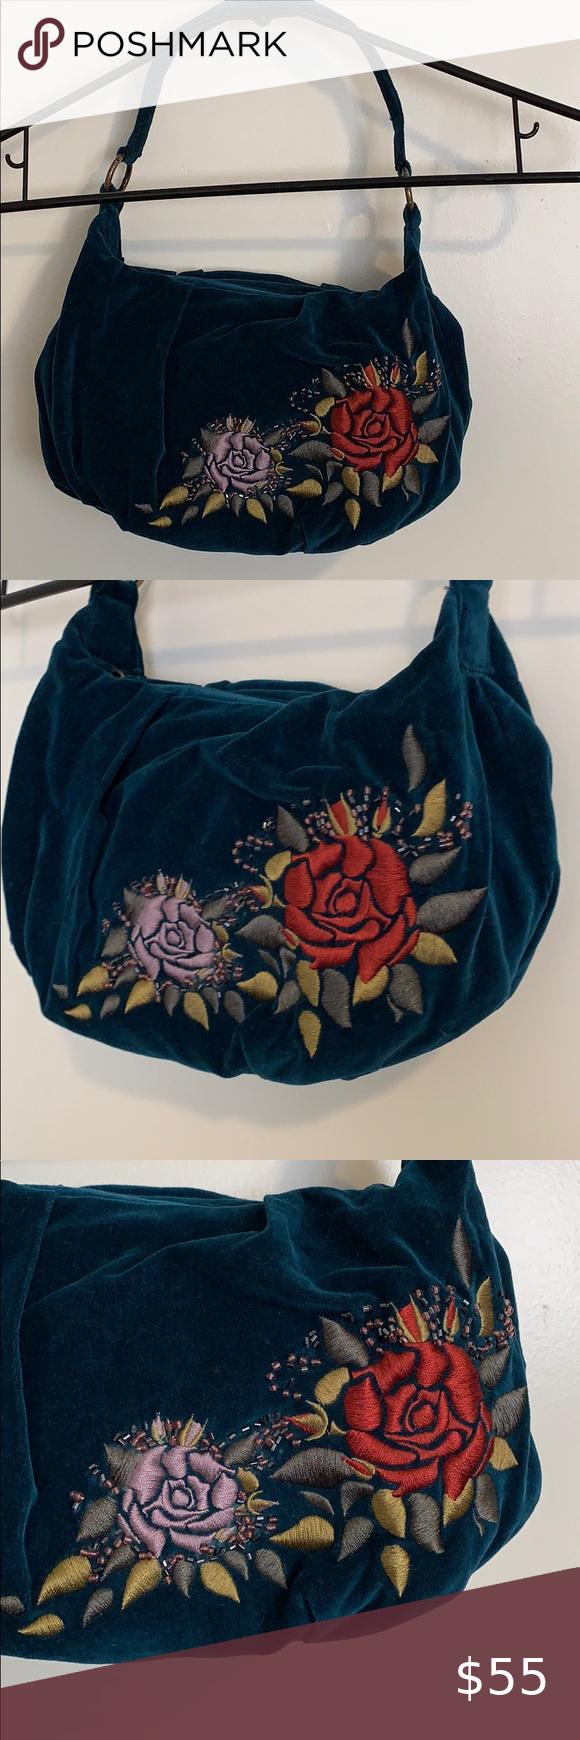 Apt 9 Velvet Rose Blue Bag Apt 9 Blue Velvet embroidered Rose Purse Brand New Lots of Space One Zipper Pocket inside Beautiful Blue Green Velvet Purse Has embroidered Ros...